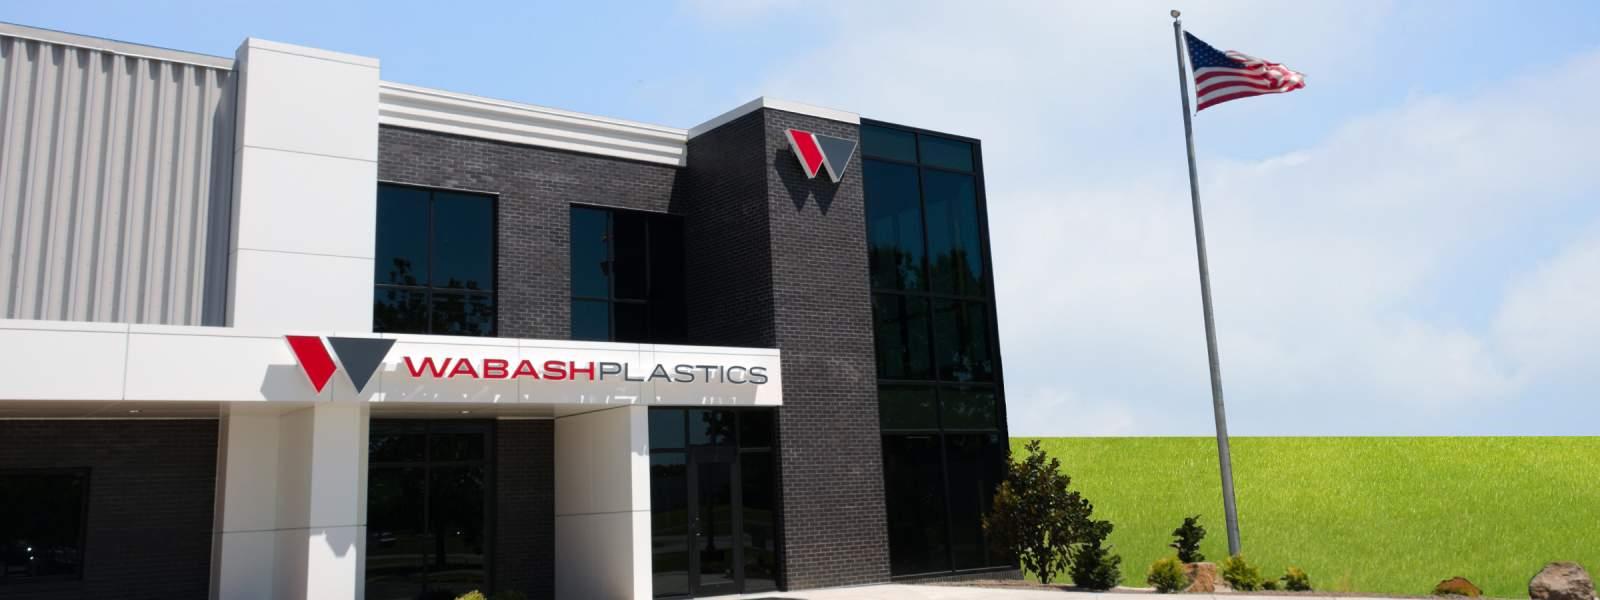 About Us Wabash Plastics